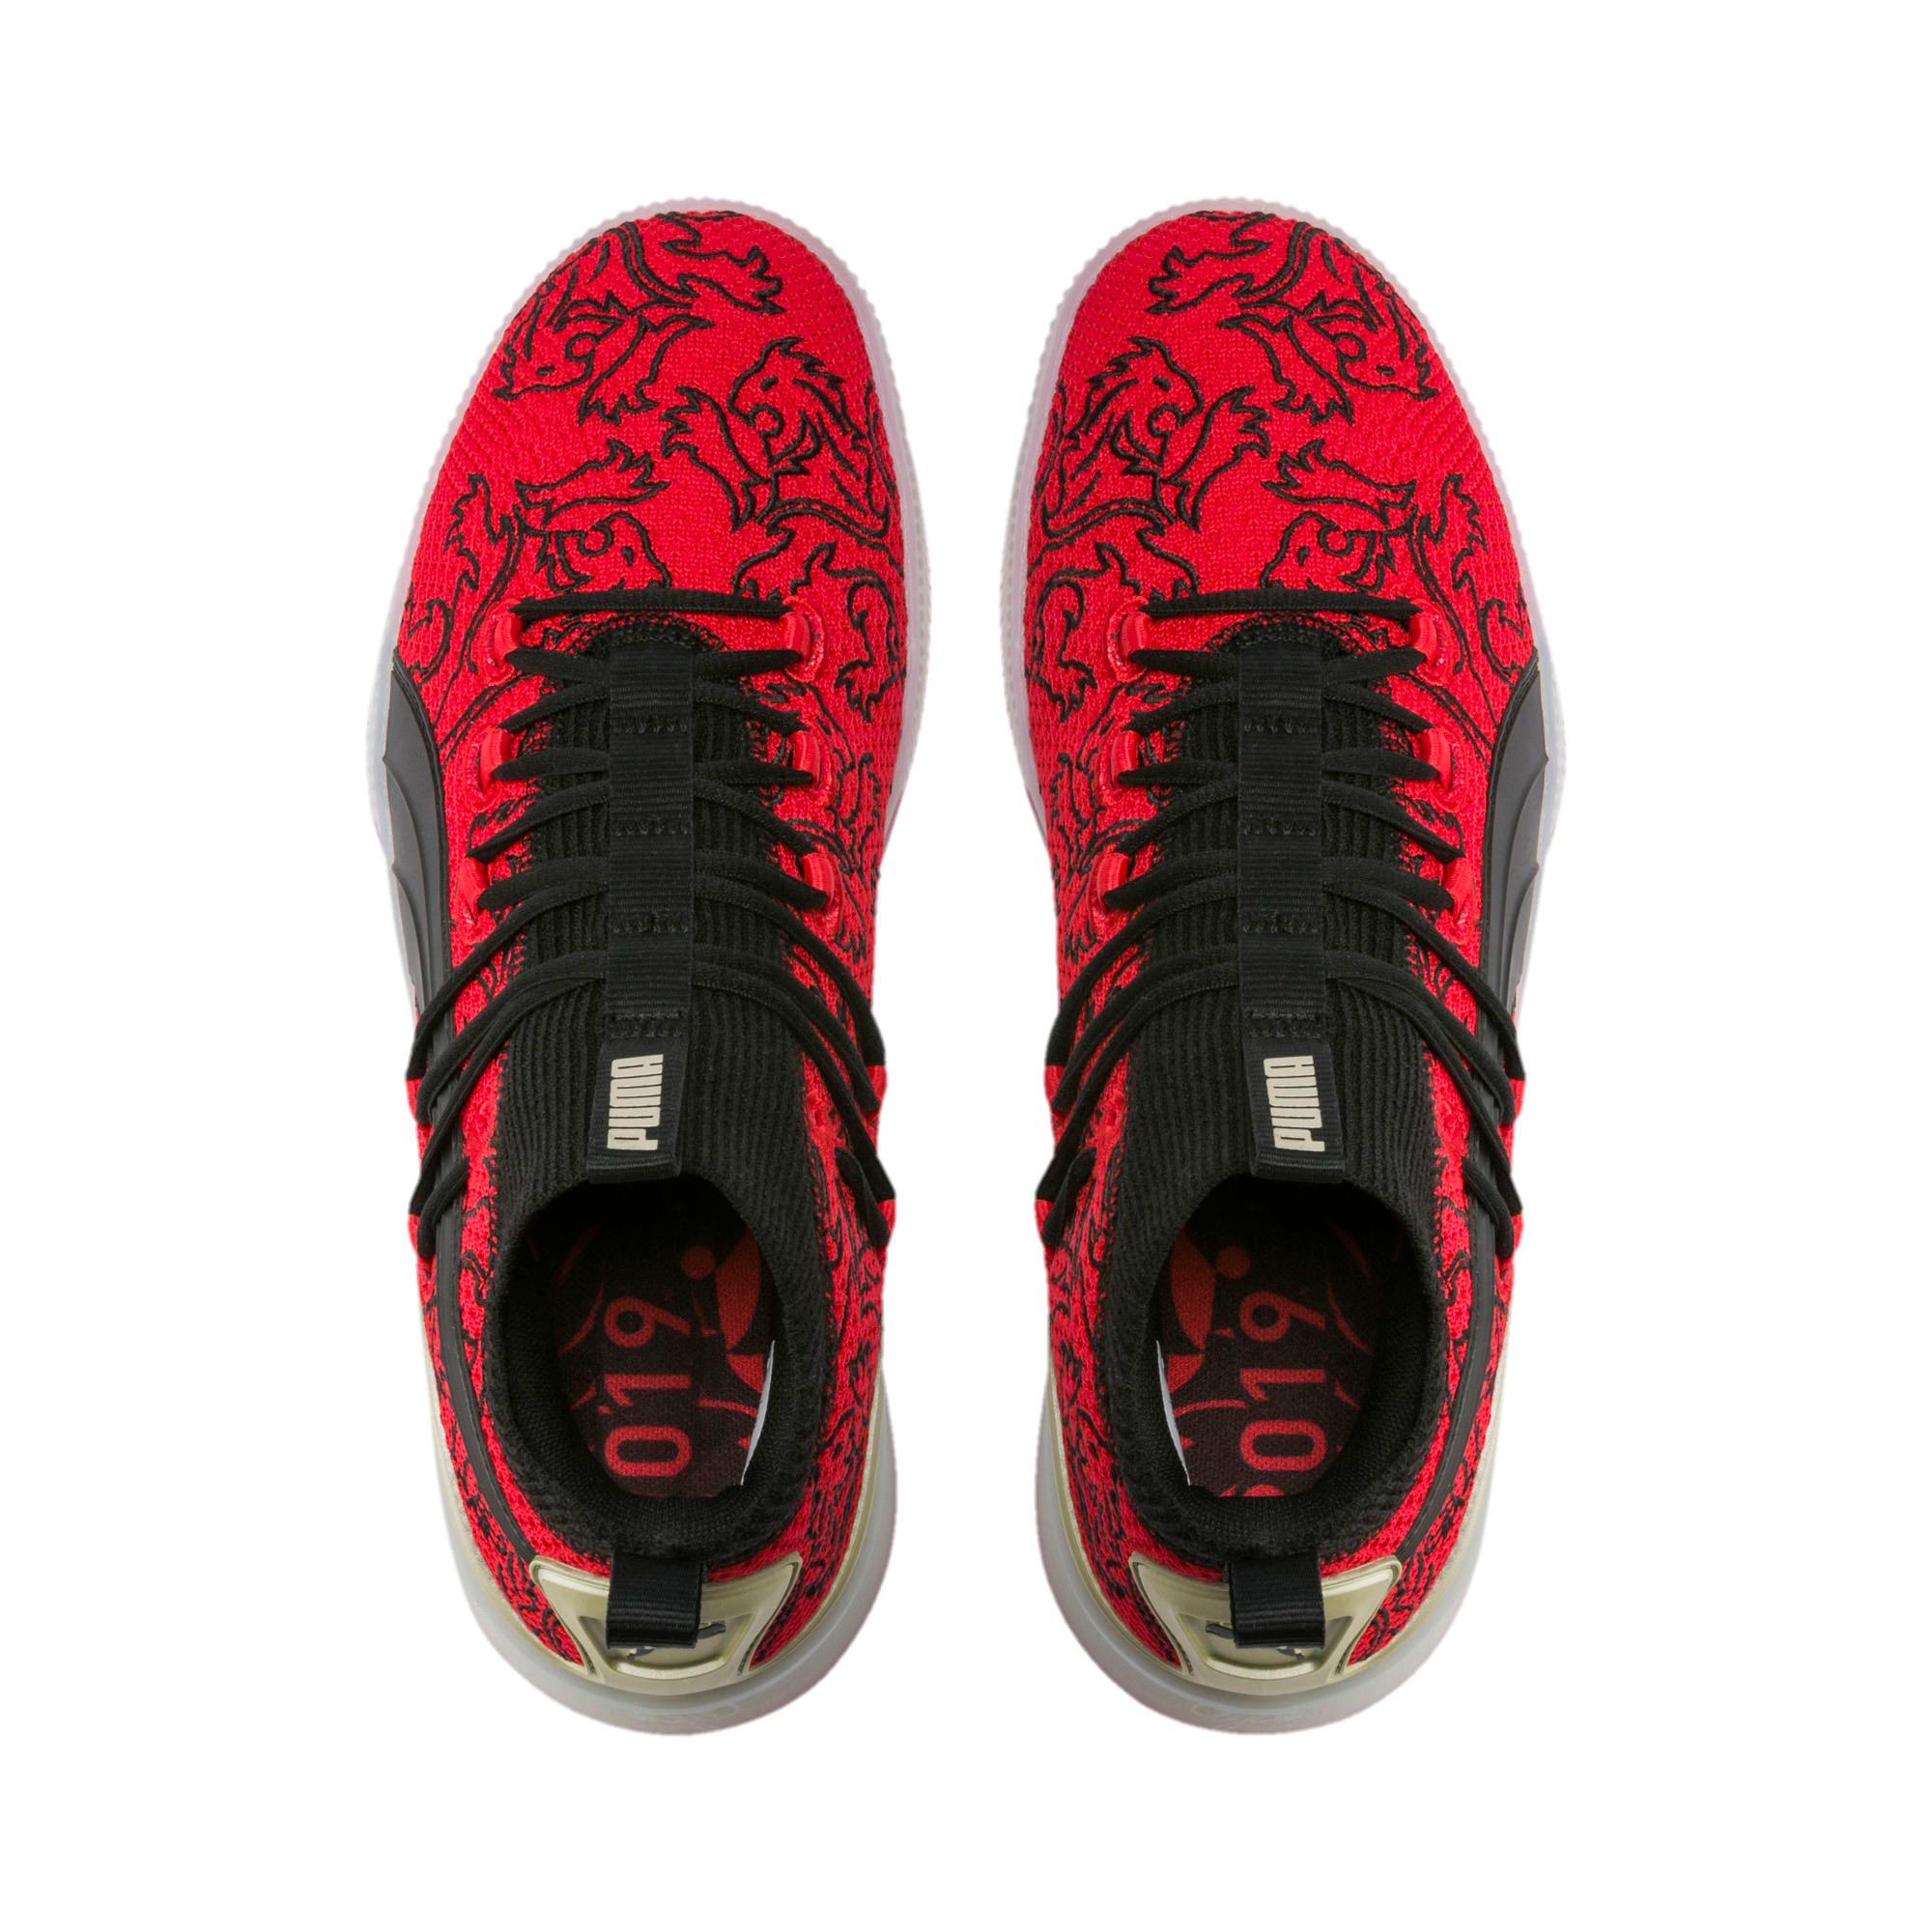 Thumbnail 6 of Clyde Court London Men's Basketball Shoes, High Risk Red-Puma Black, medium